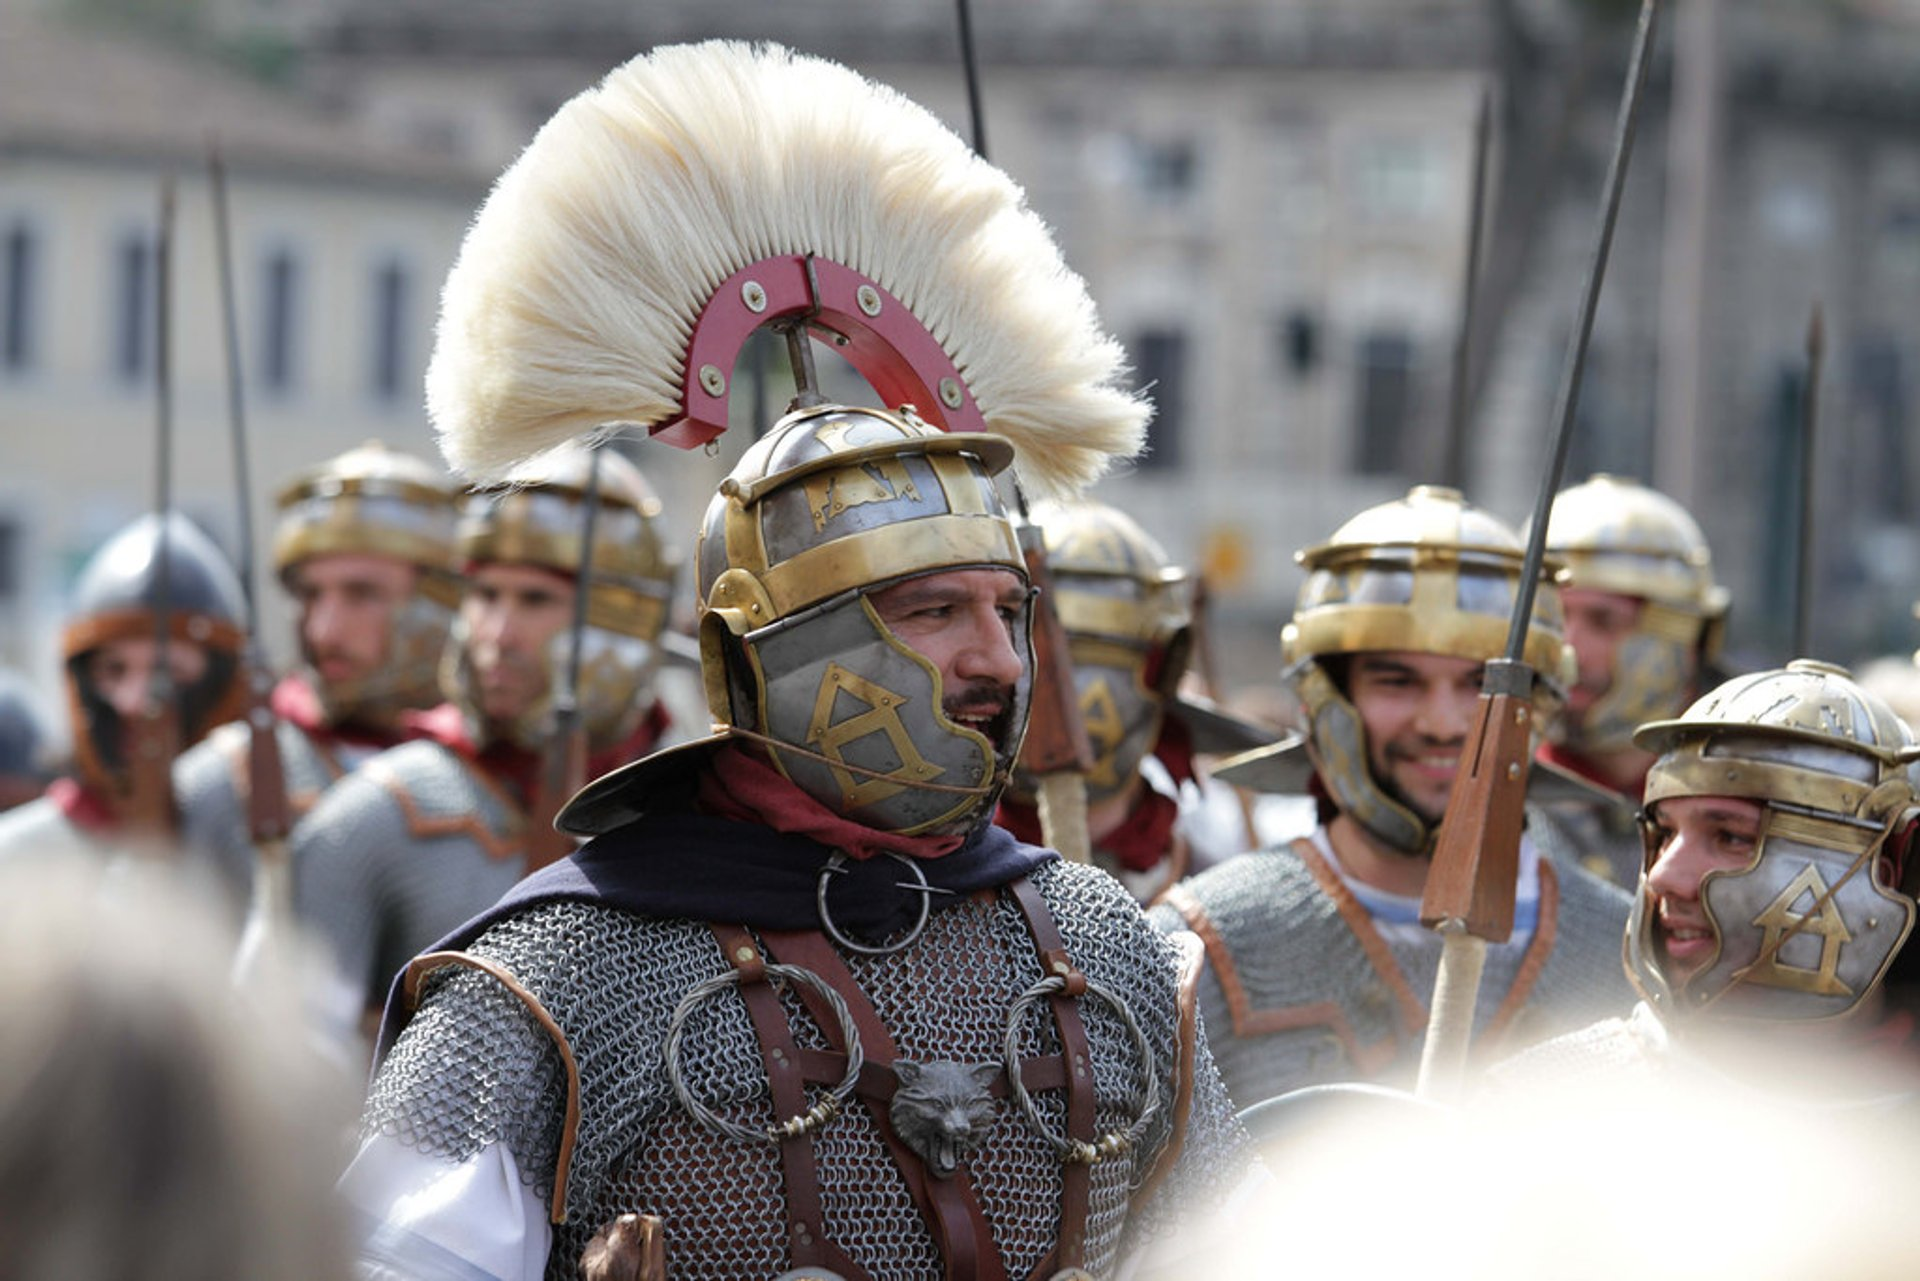 Natale di Roma or Rome's Birthday in Rome - Best Season 2020